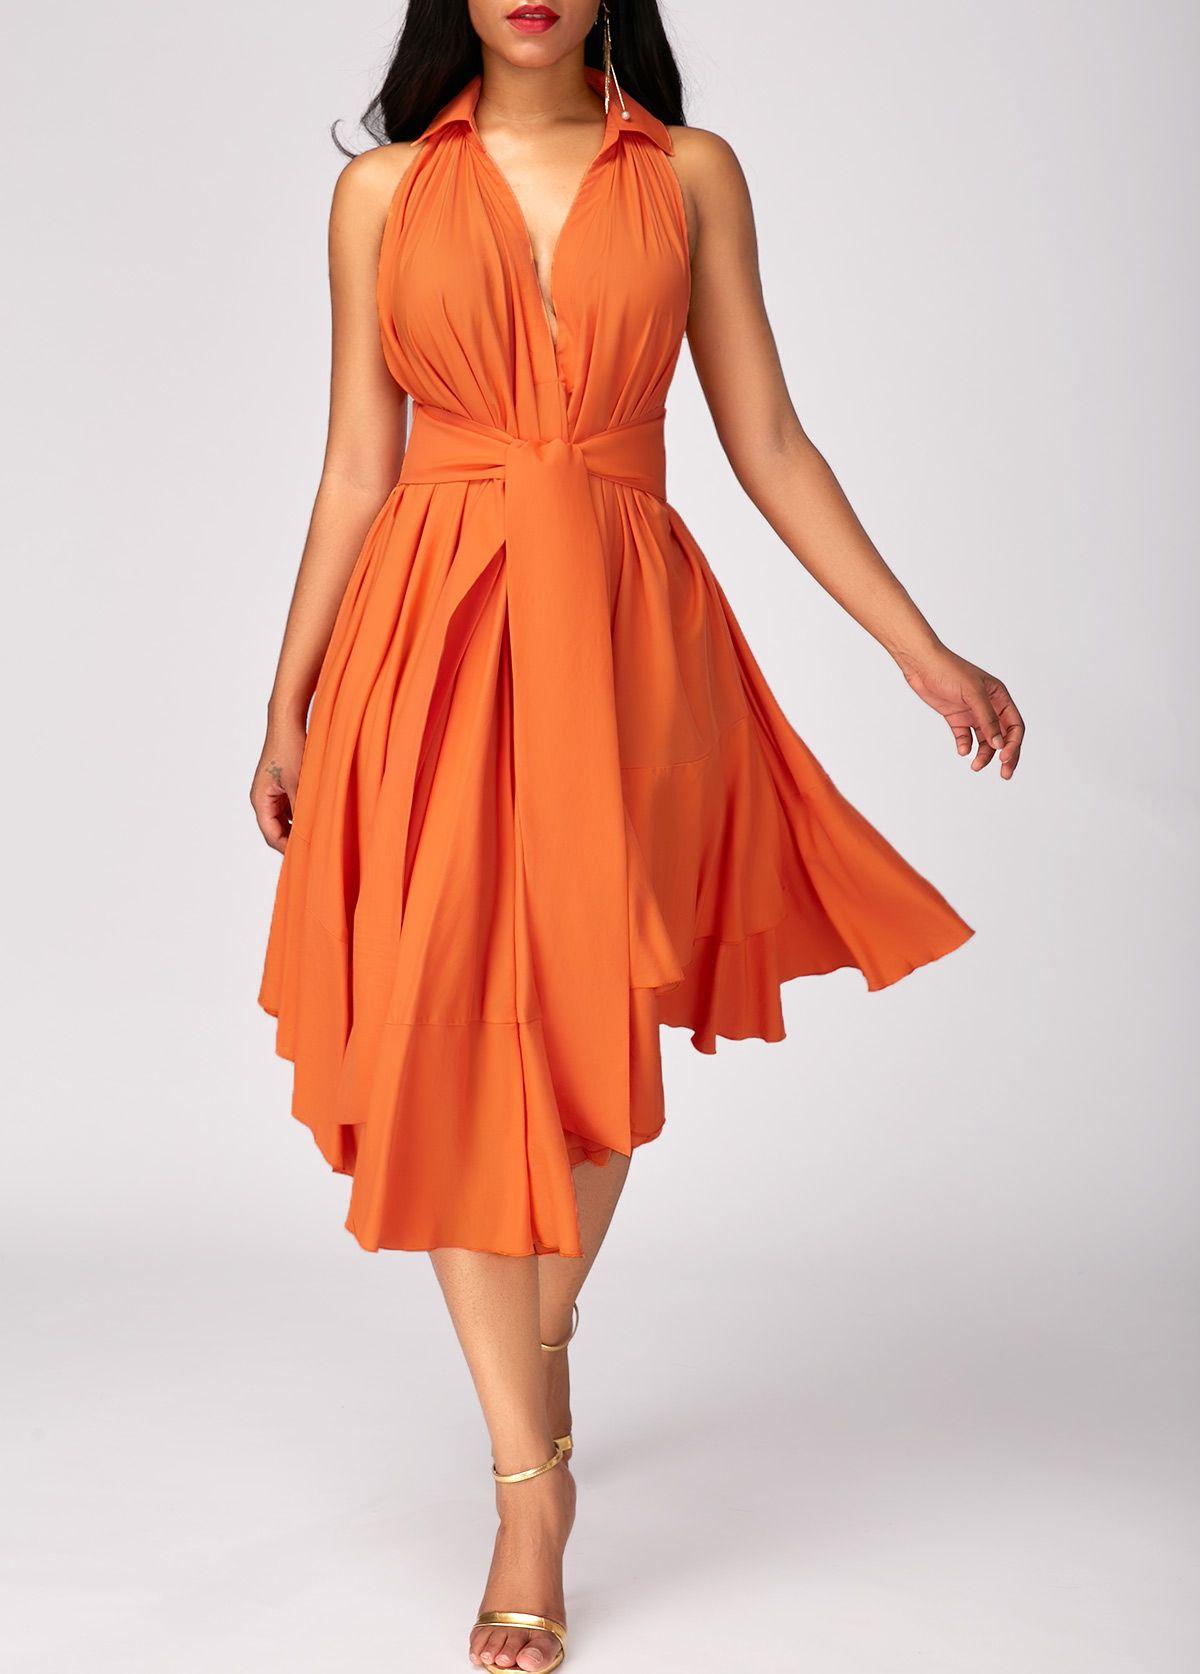 Asymmetric Hem Magas Derekretegu Narancssarga Ruha Rotita Com Usd 30 58 Orange Dress Fashion Dresses Online Casual Dresses [ 1674 x 1200 Pixel ]